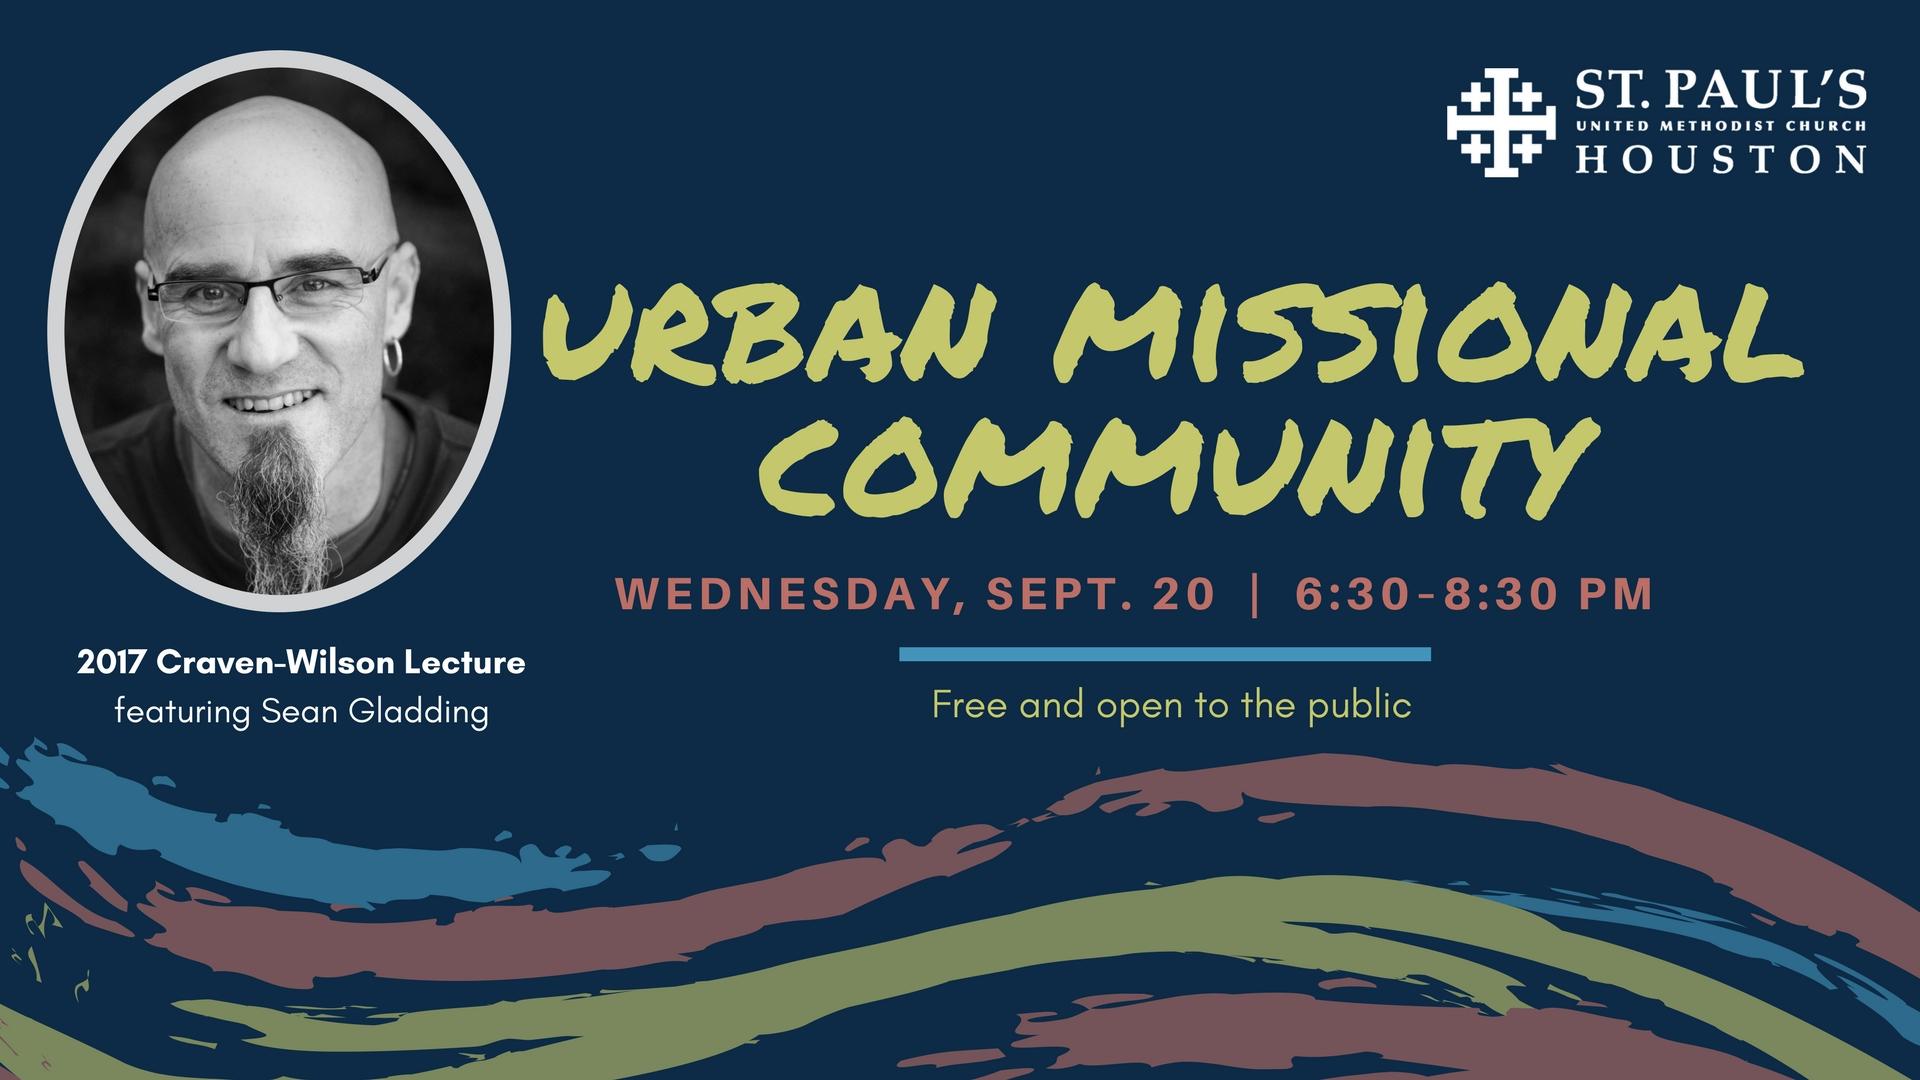 16x9 Urban Missional Community on Sept. 20.jpg